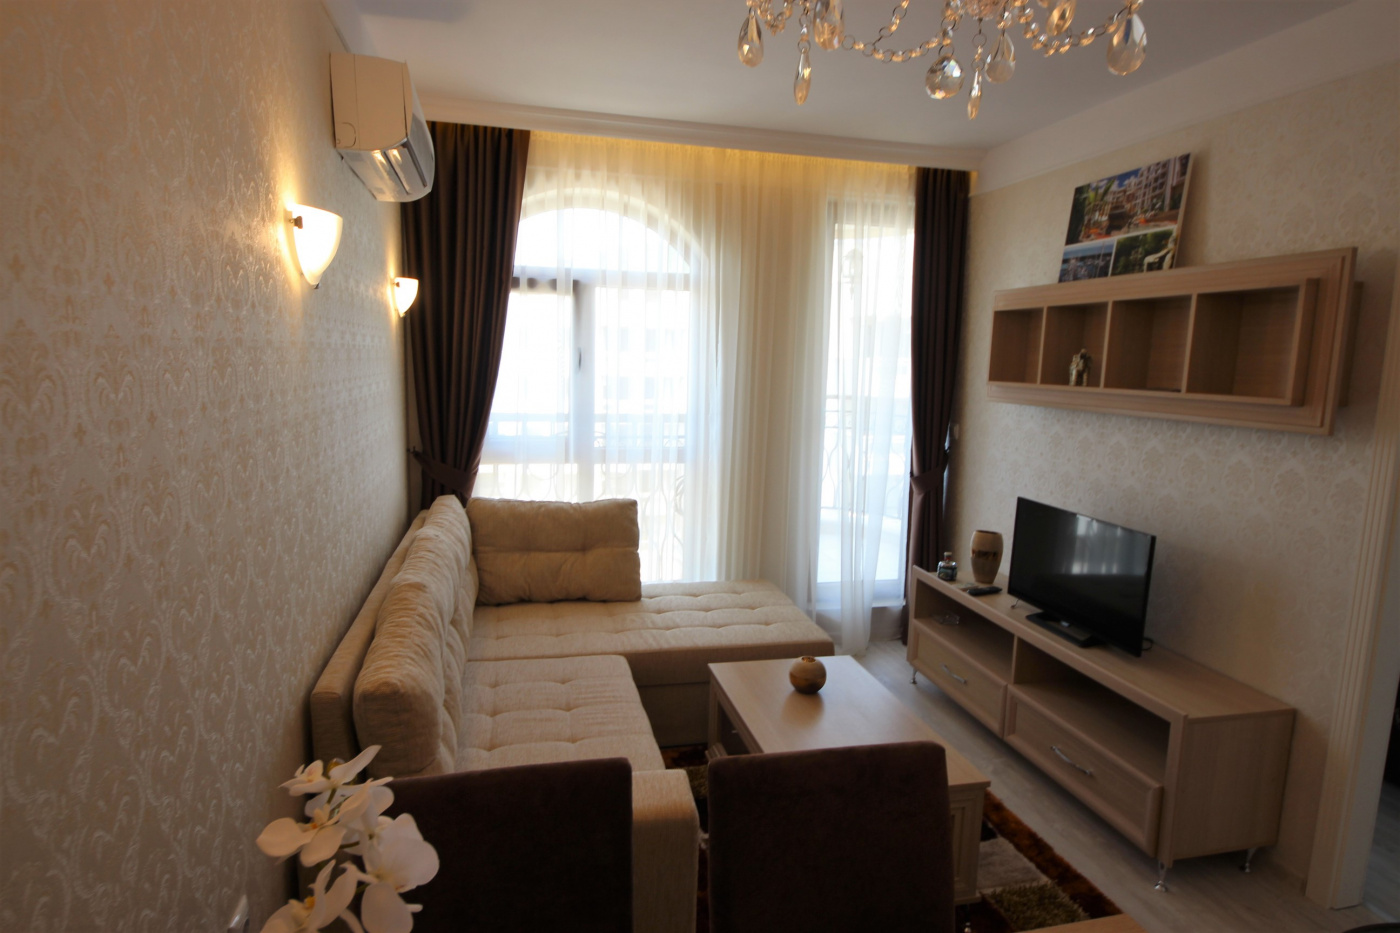 Harmony Suites X apartament 10-504